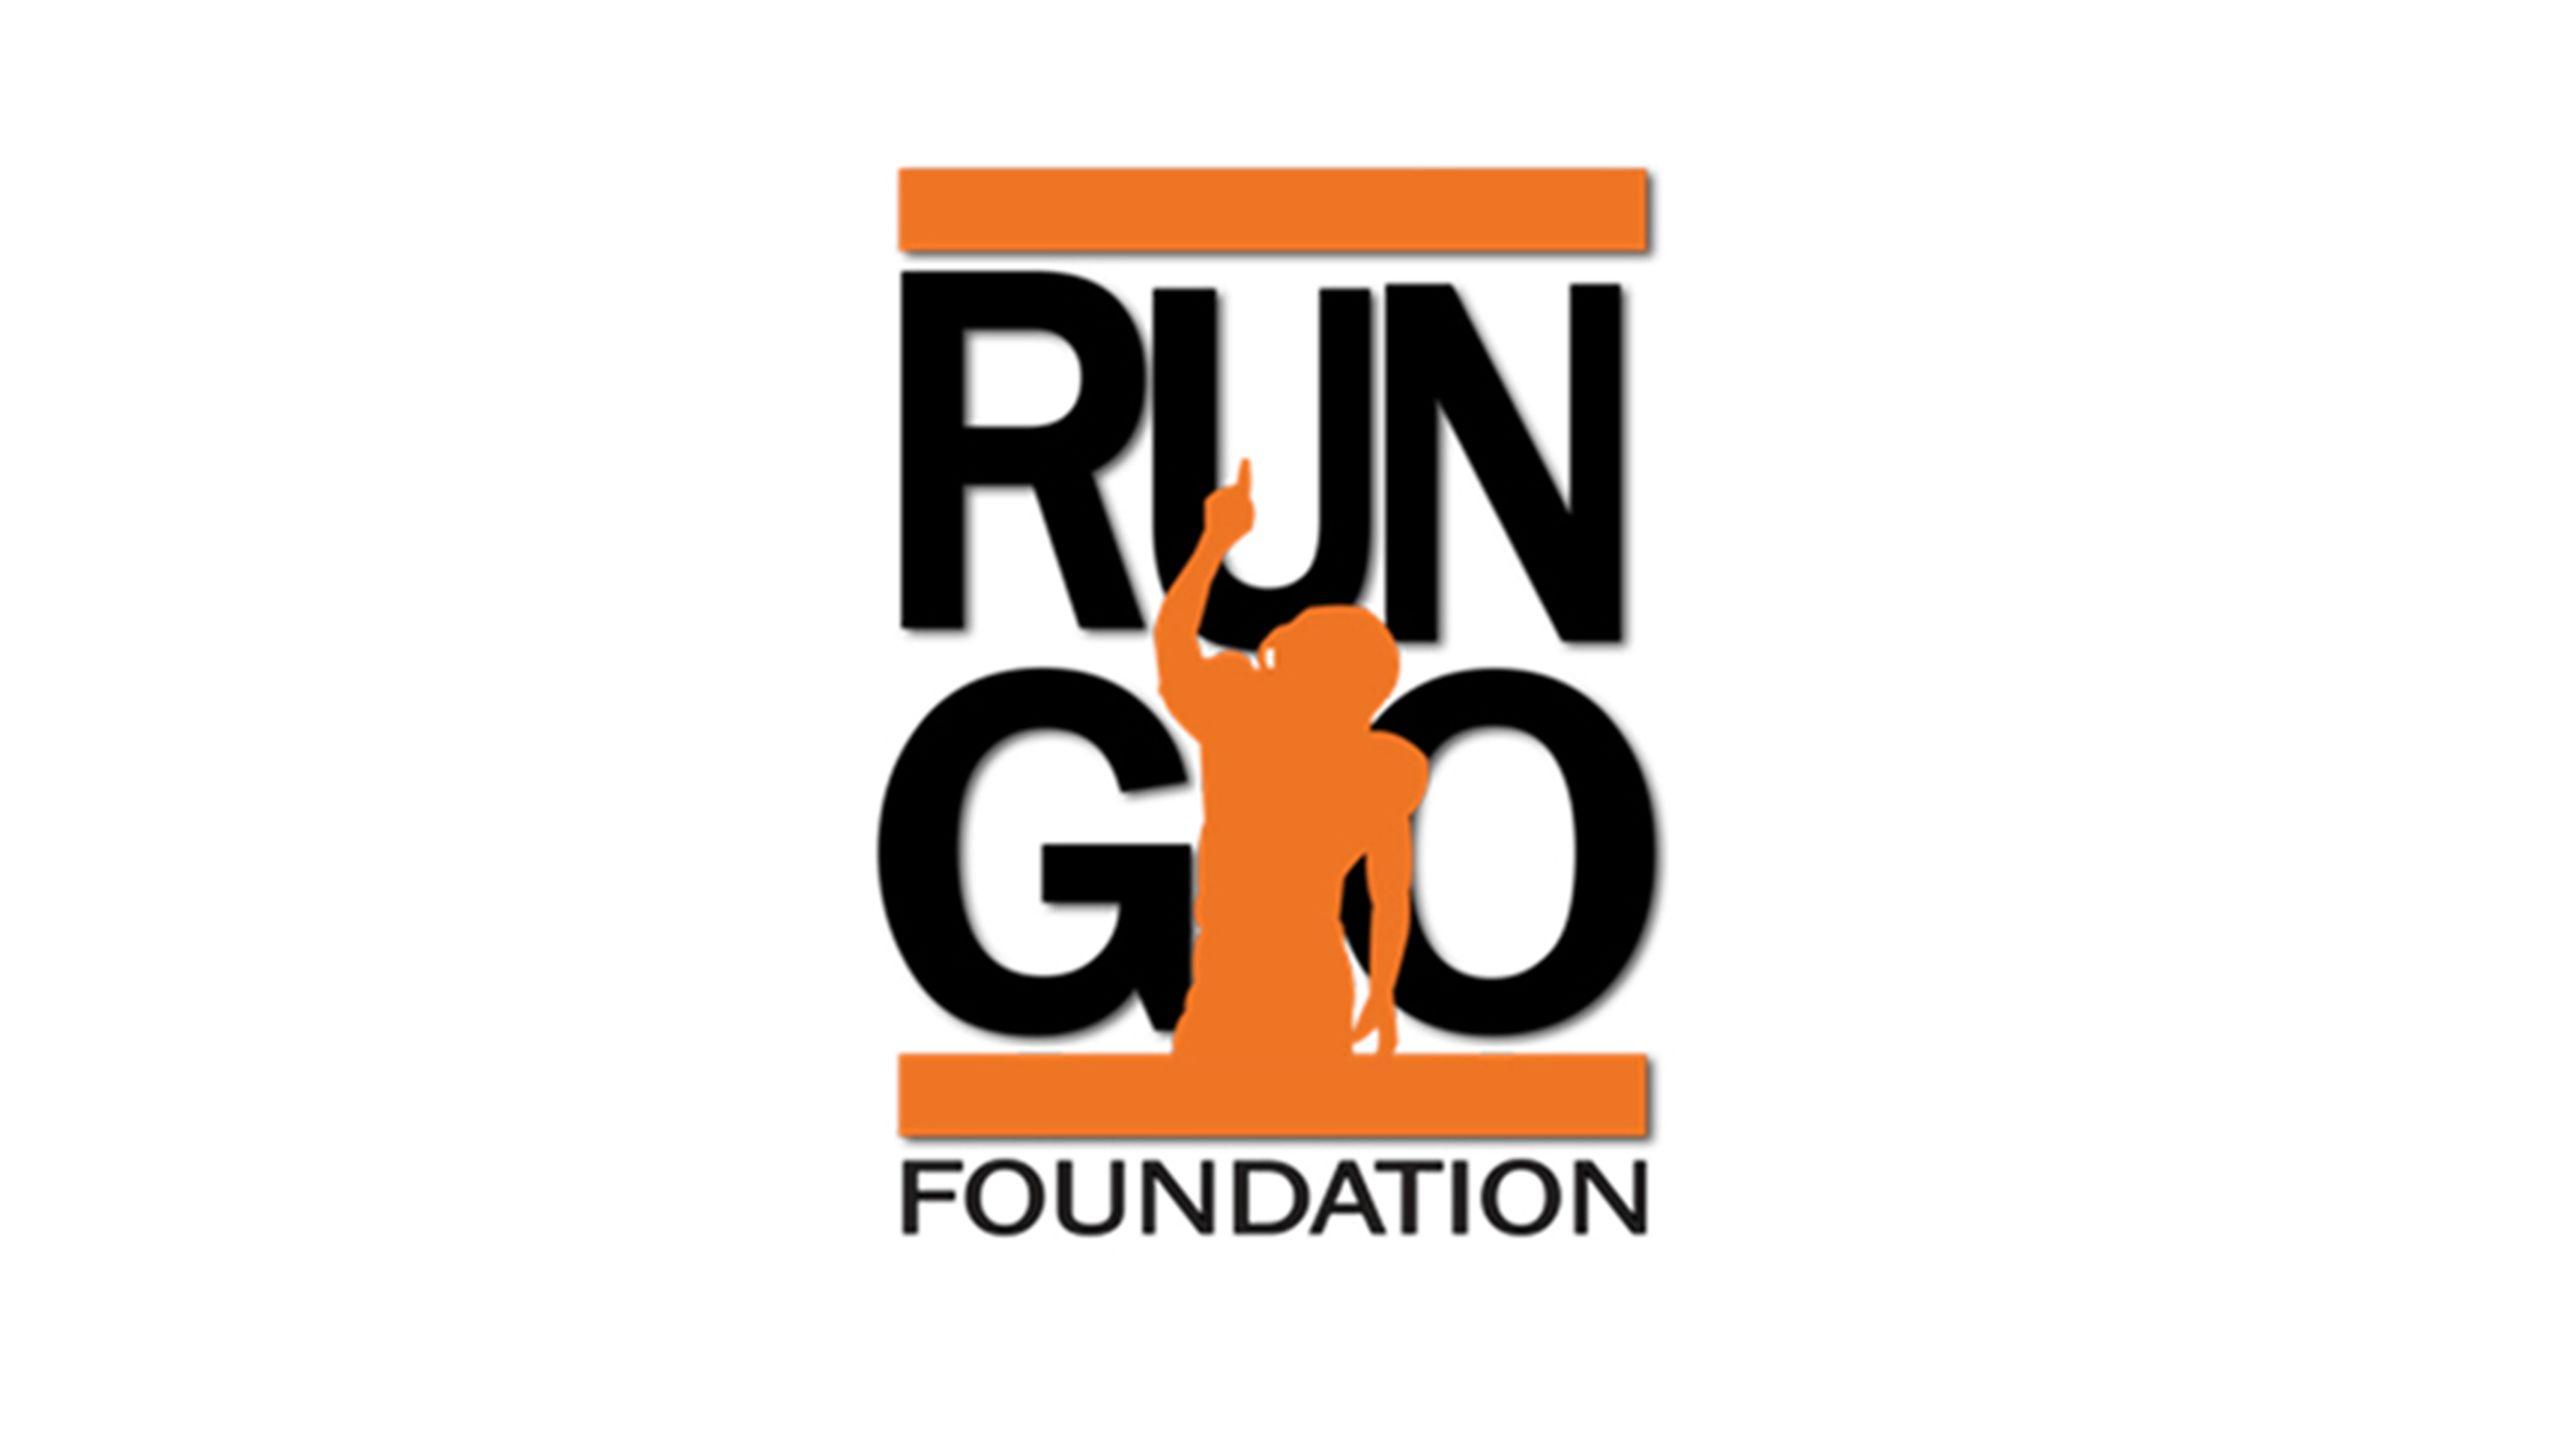 Run Gio Foundation